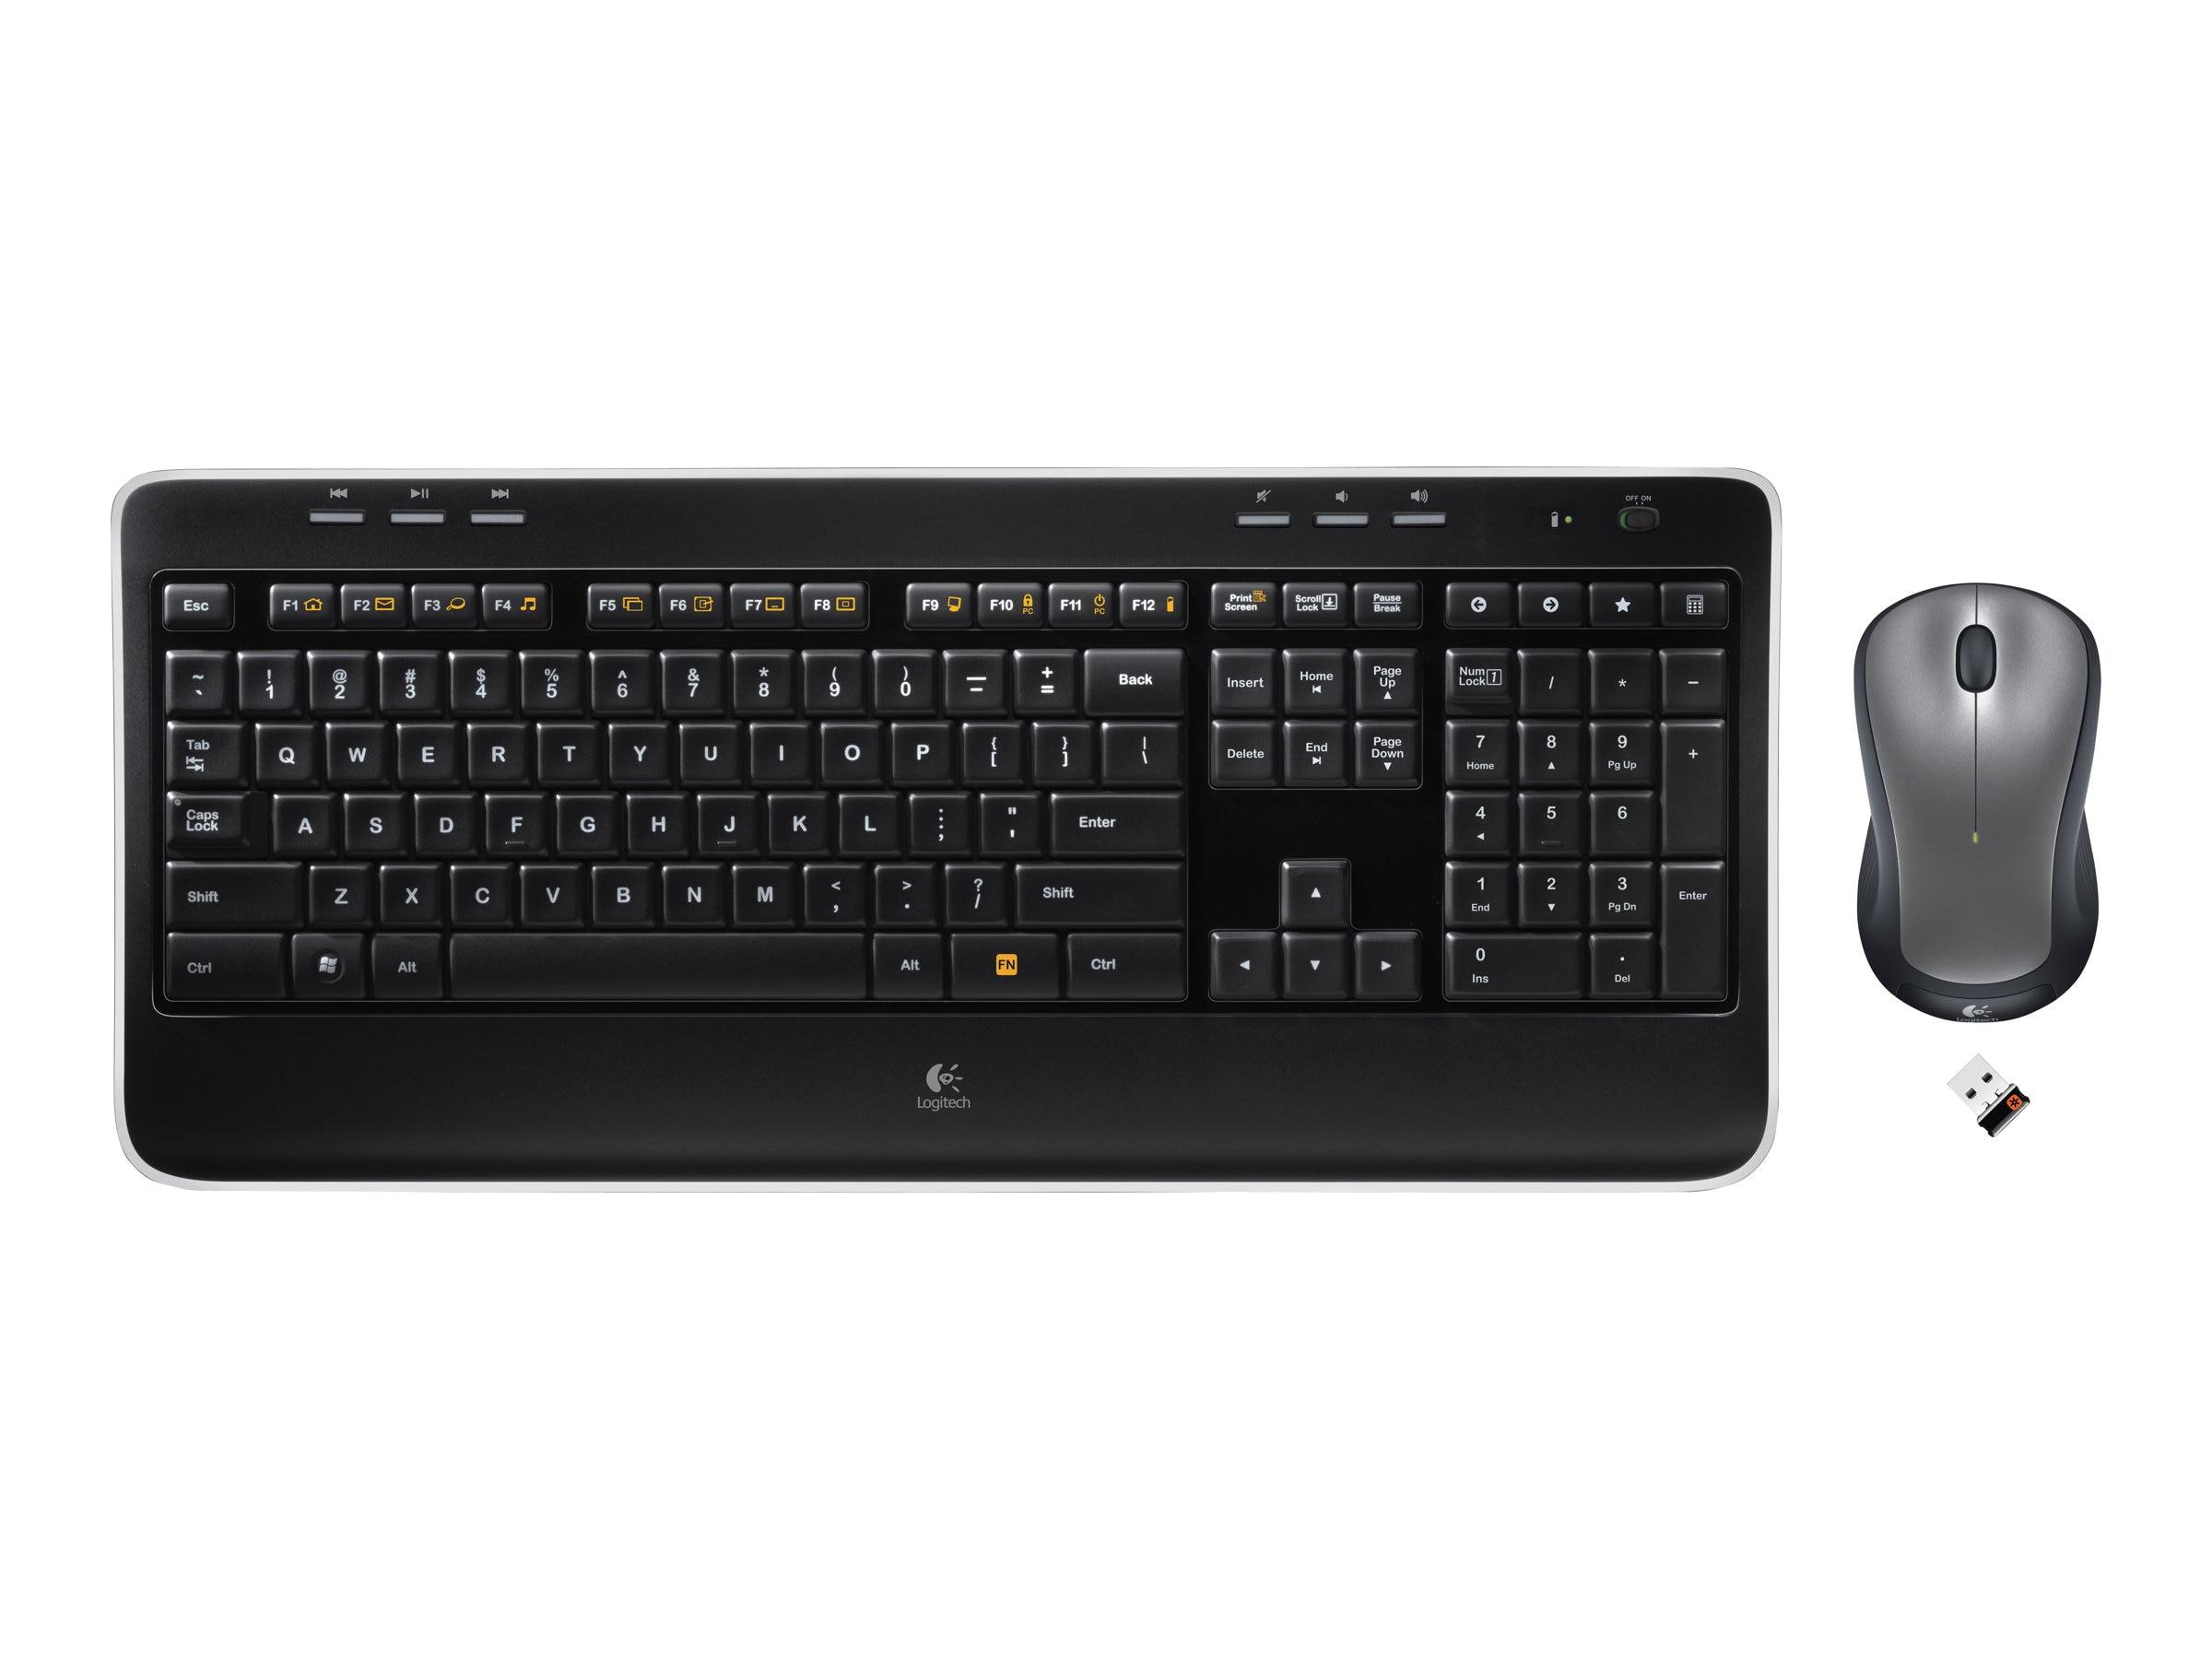 Logitech Wireless Combo MK520, 920-002553, 11711836, Keyboard/Mouse Combinations